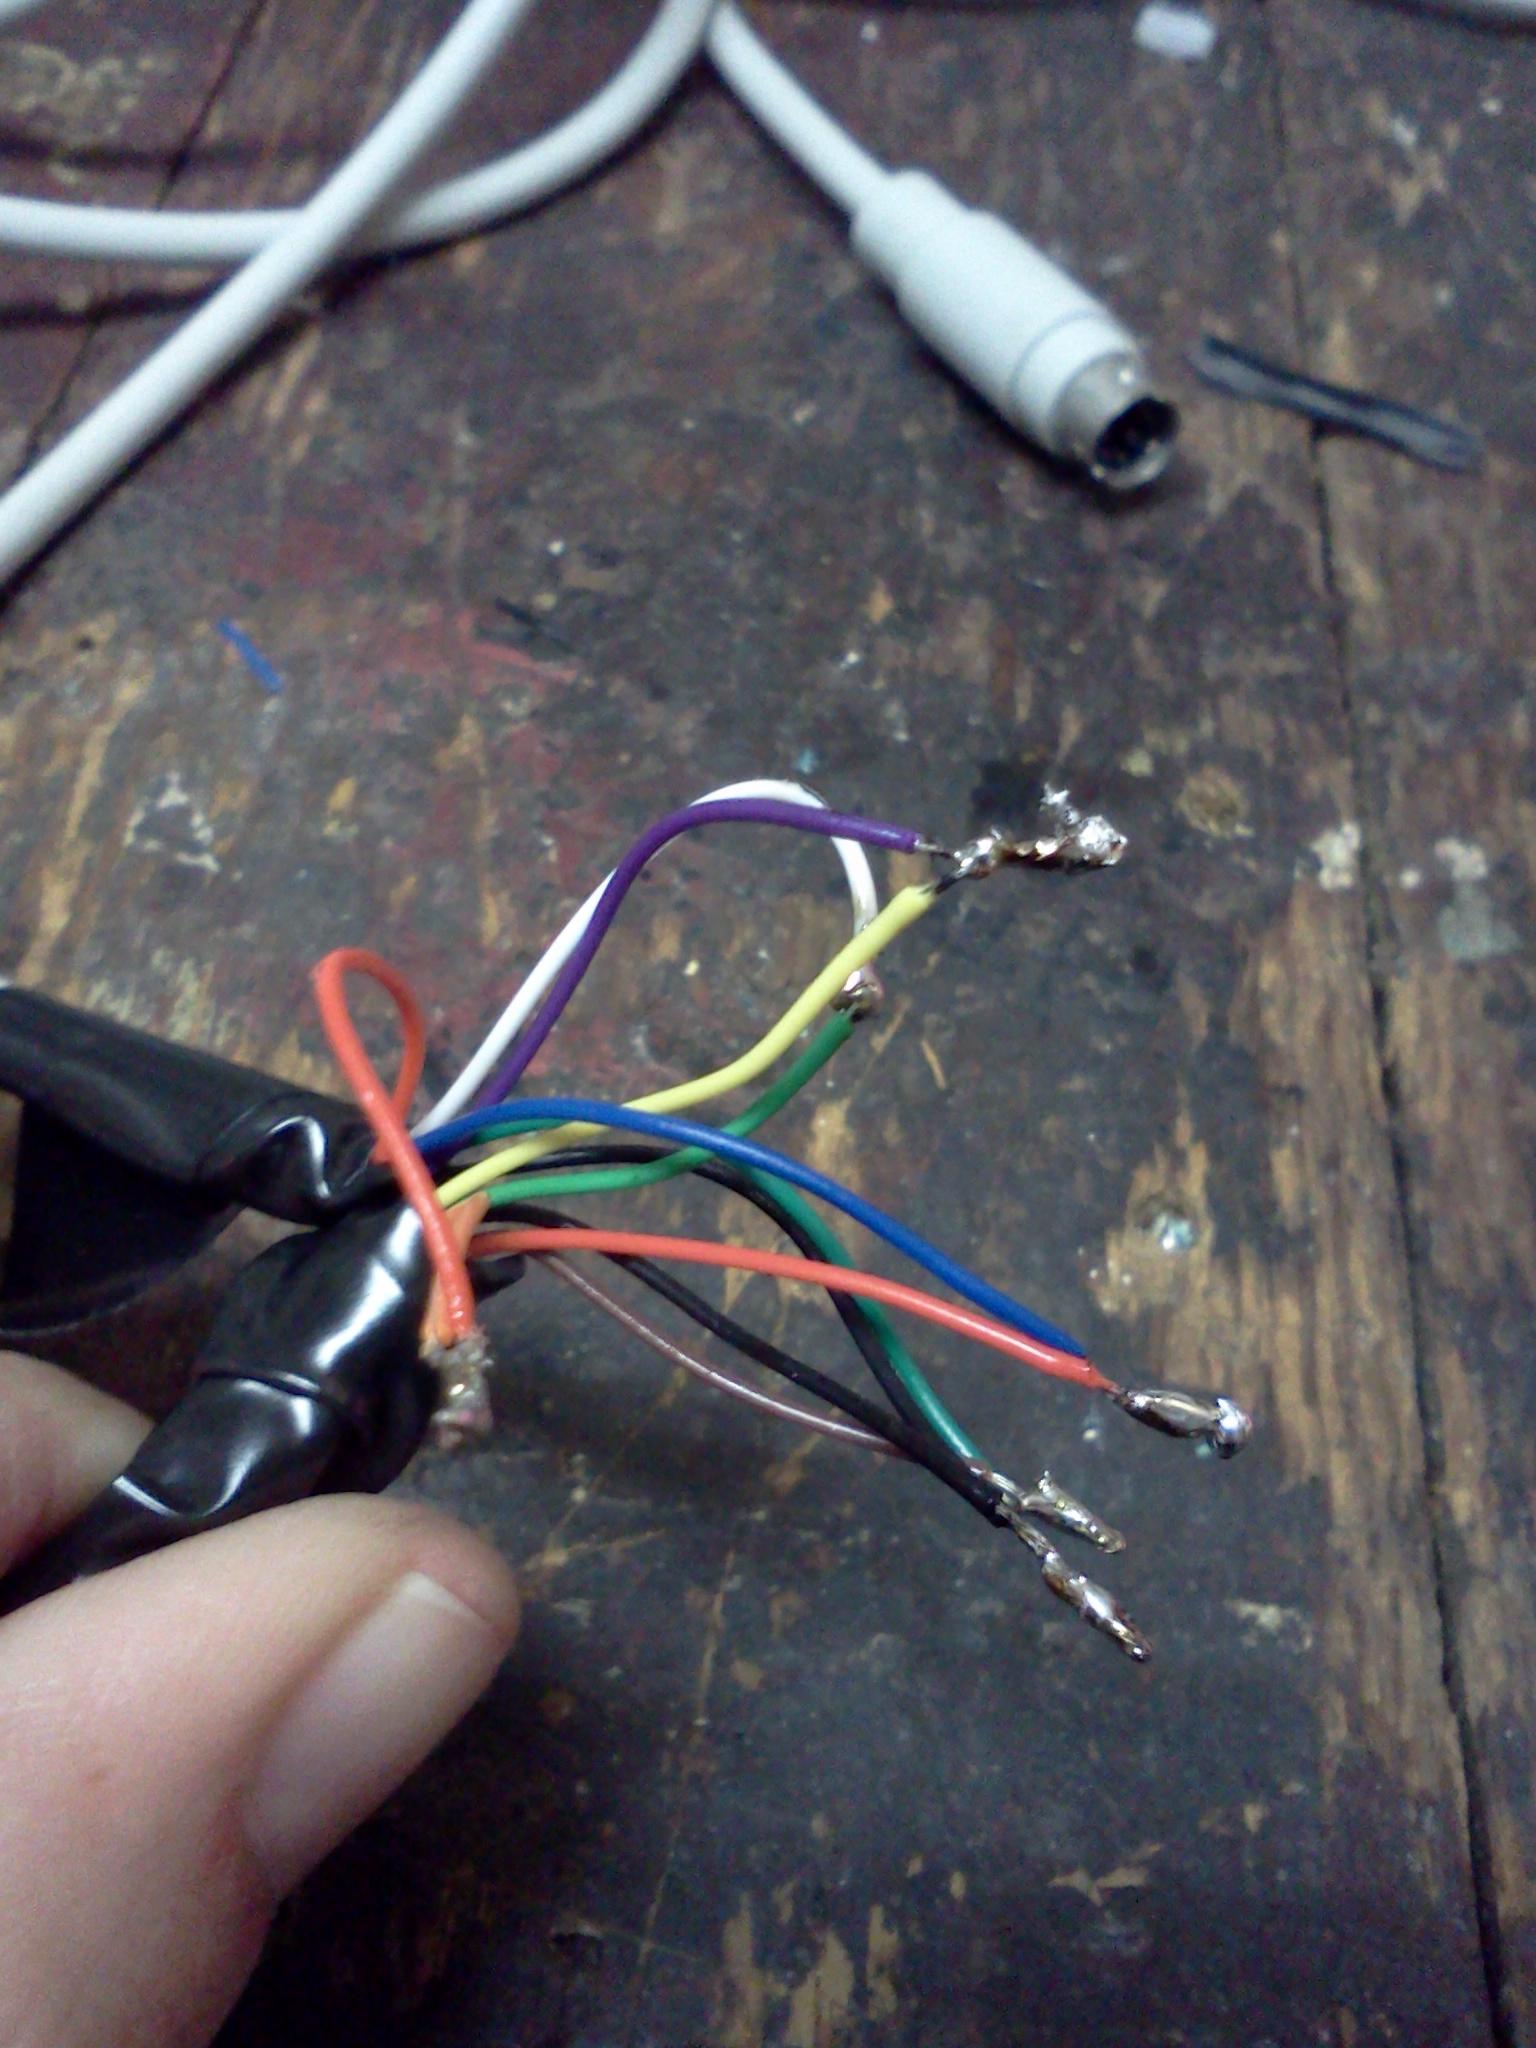 klipsch promedia 2 1 wiring diagram chevy trailer harness images subwoofer lifier schematic blaupunkt